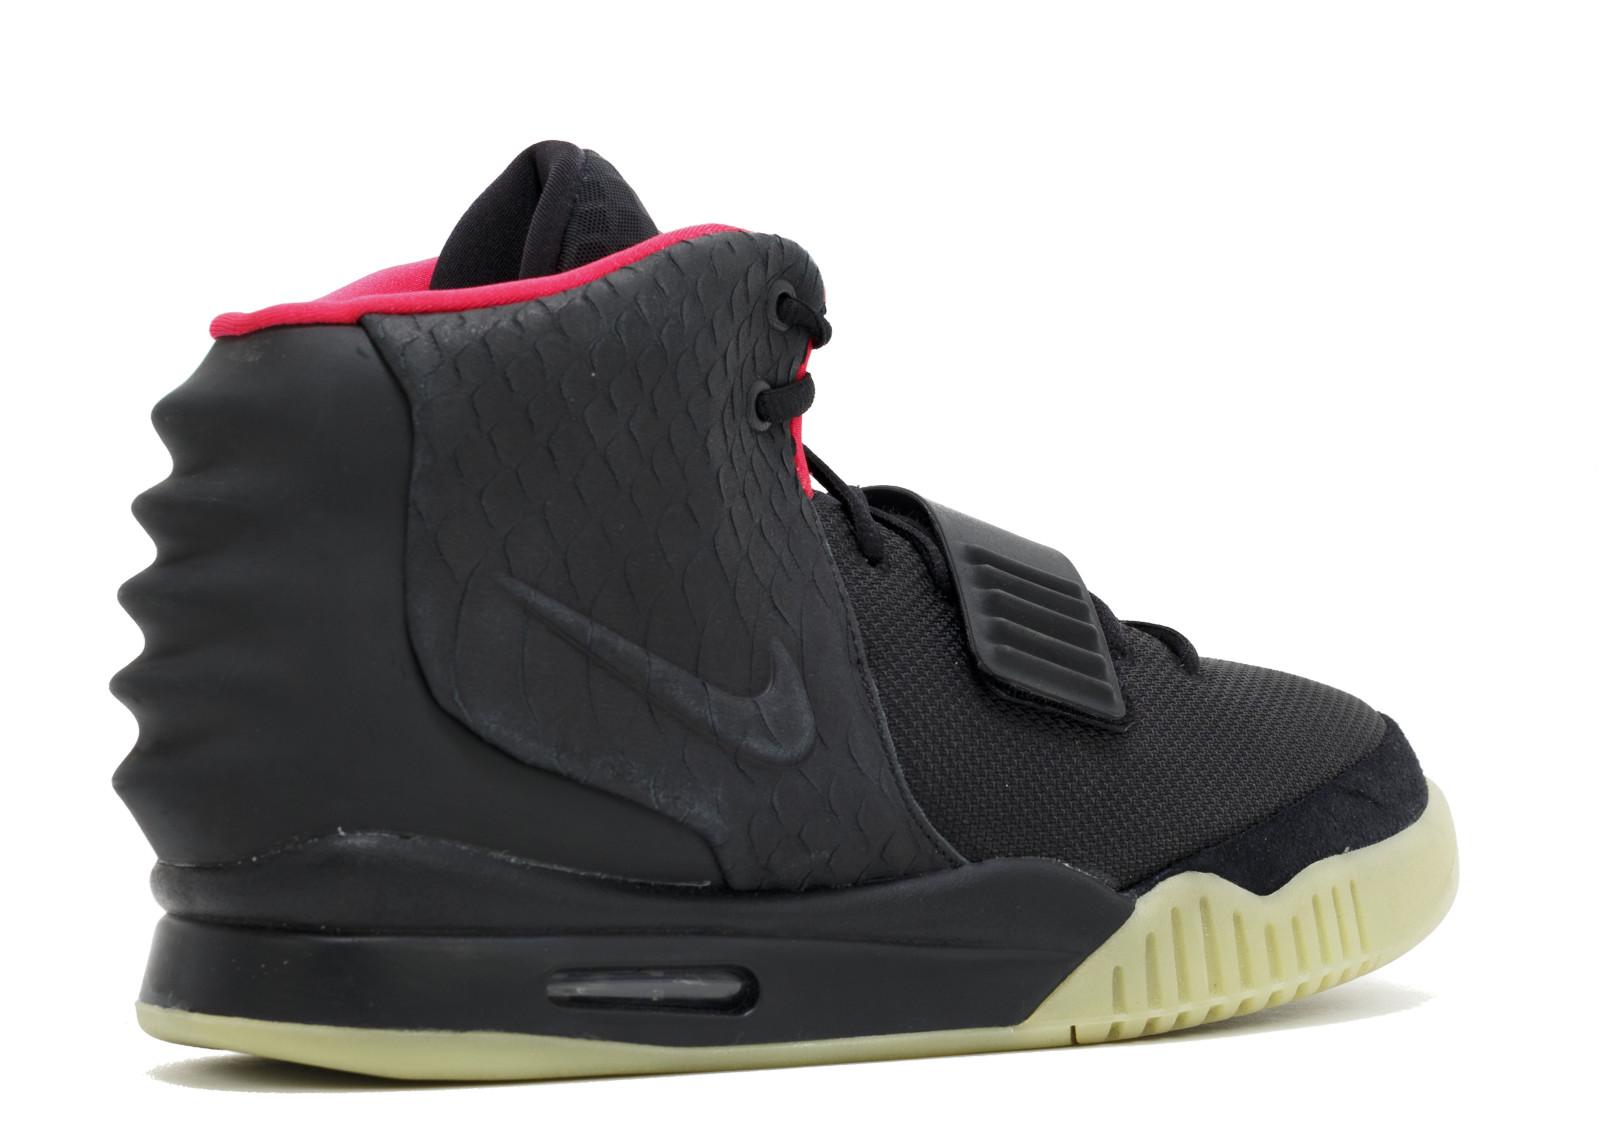 cheap for discount b4227 5a8ec Nike Air Yeezy 2 Solar Red - 3